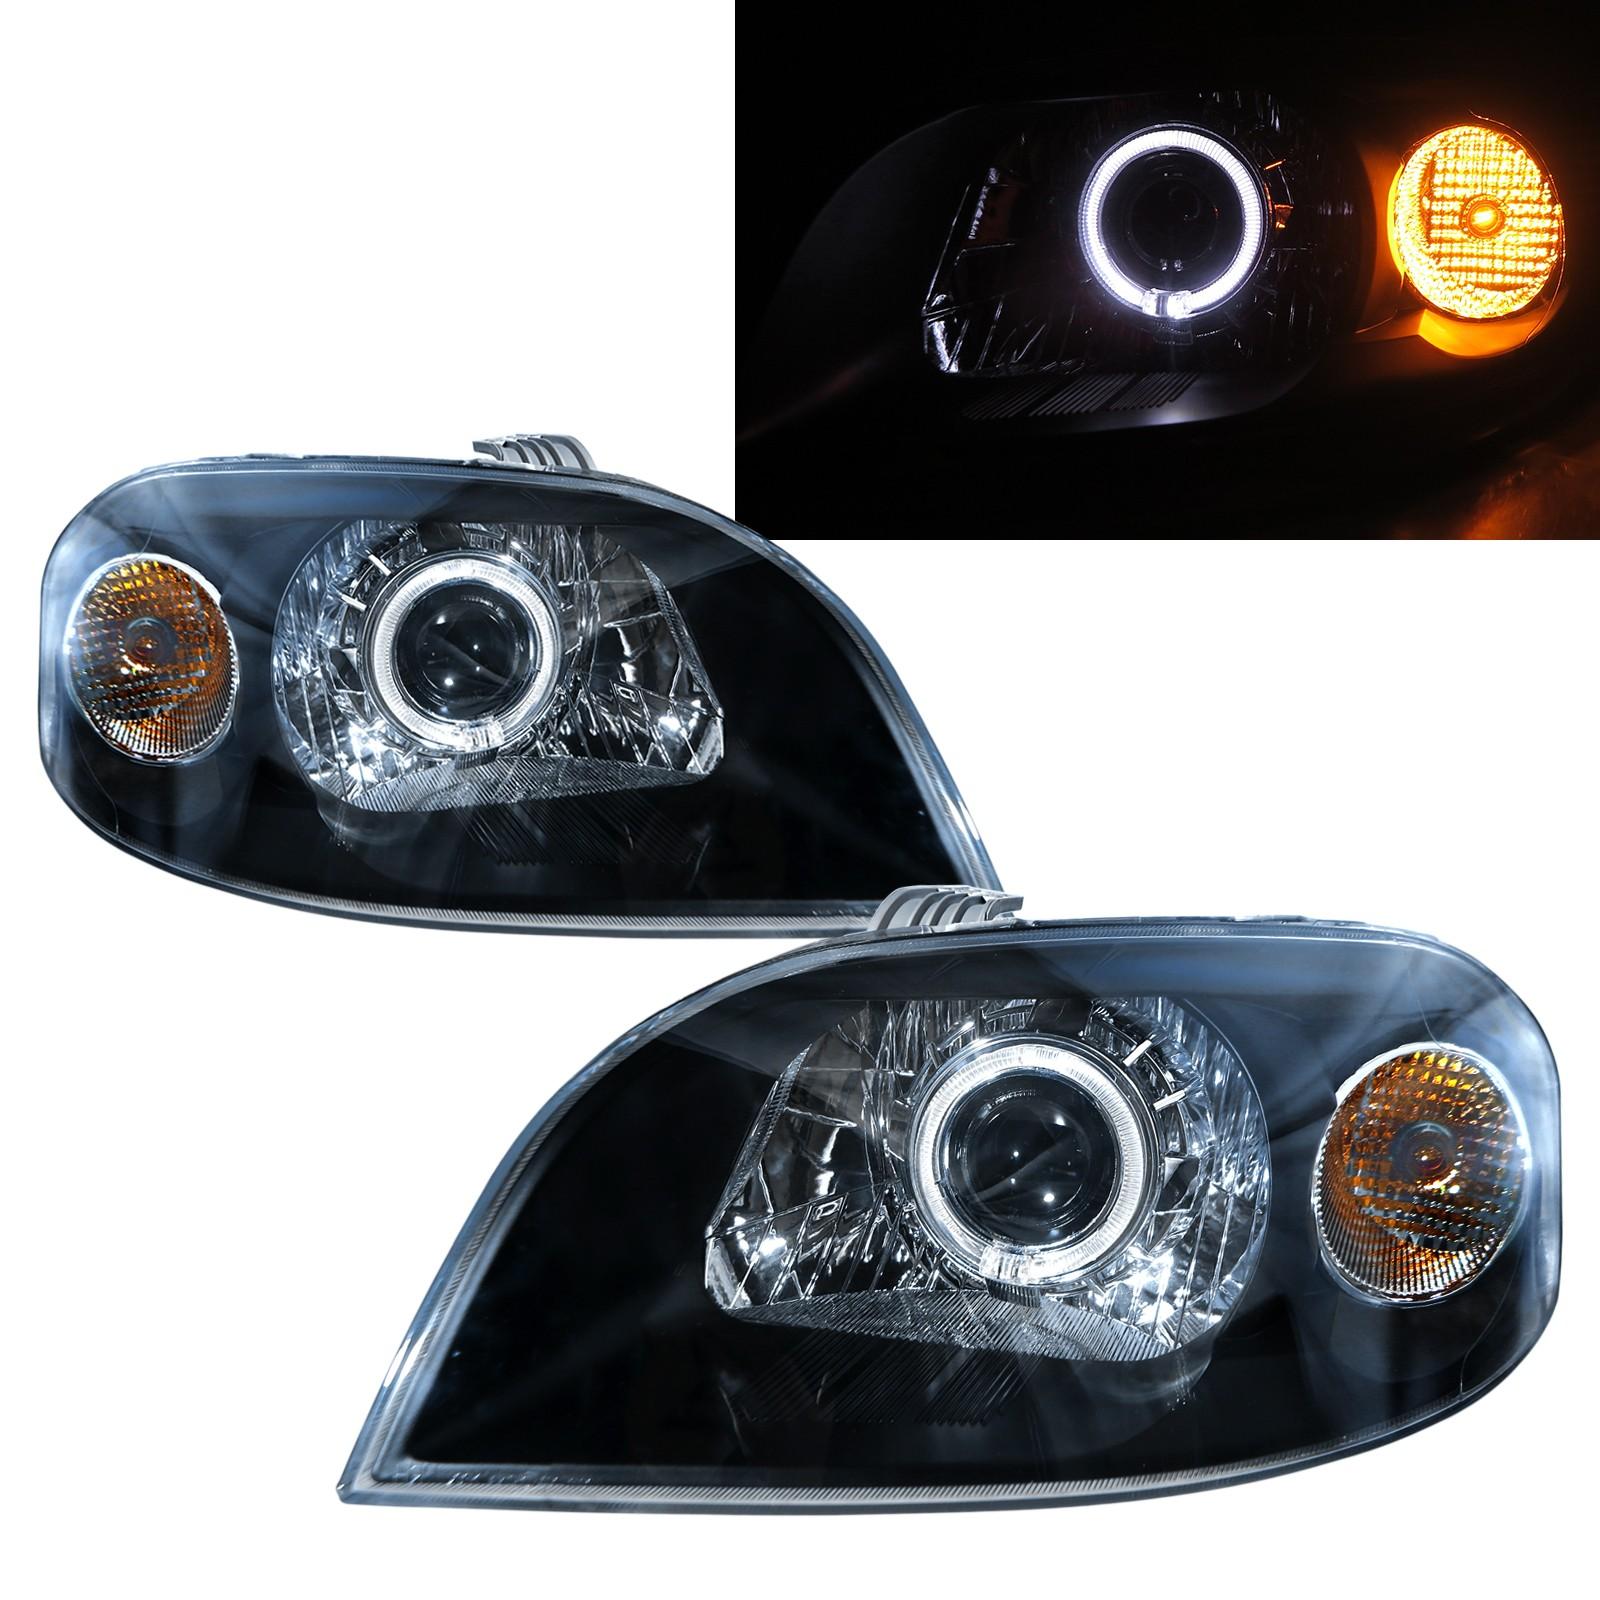 CrazyTheGod Aveo/Gentra 2007-2011 Sedan 4D Guide LED Angel-Eye Projector Headlight Headlamp Black for DAEWOO LHD